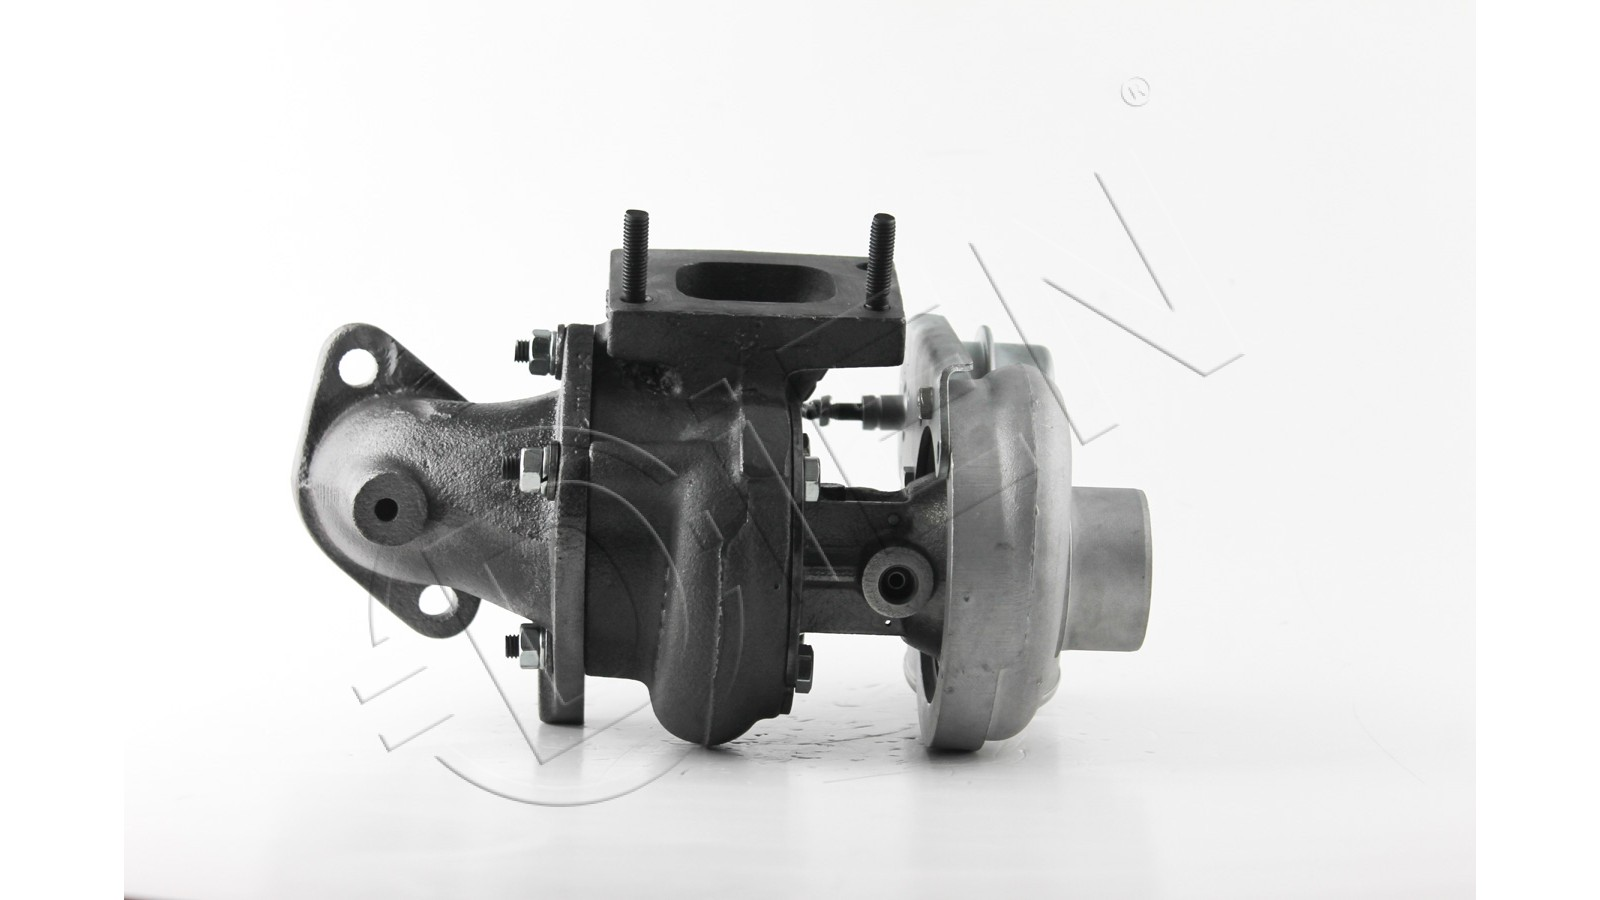 turbocompressore rigenerato per jeep cherokee 2 1 td 87cv. Black Bedroom Furniture Sets. Home Design Ideas